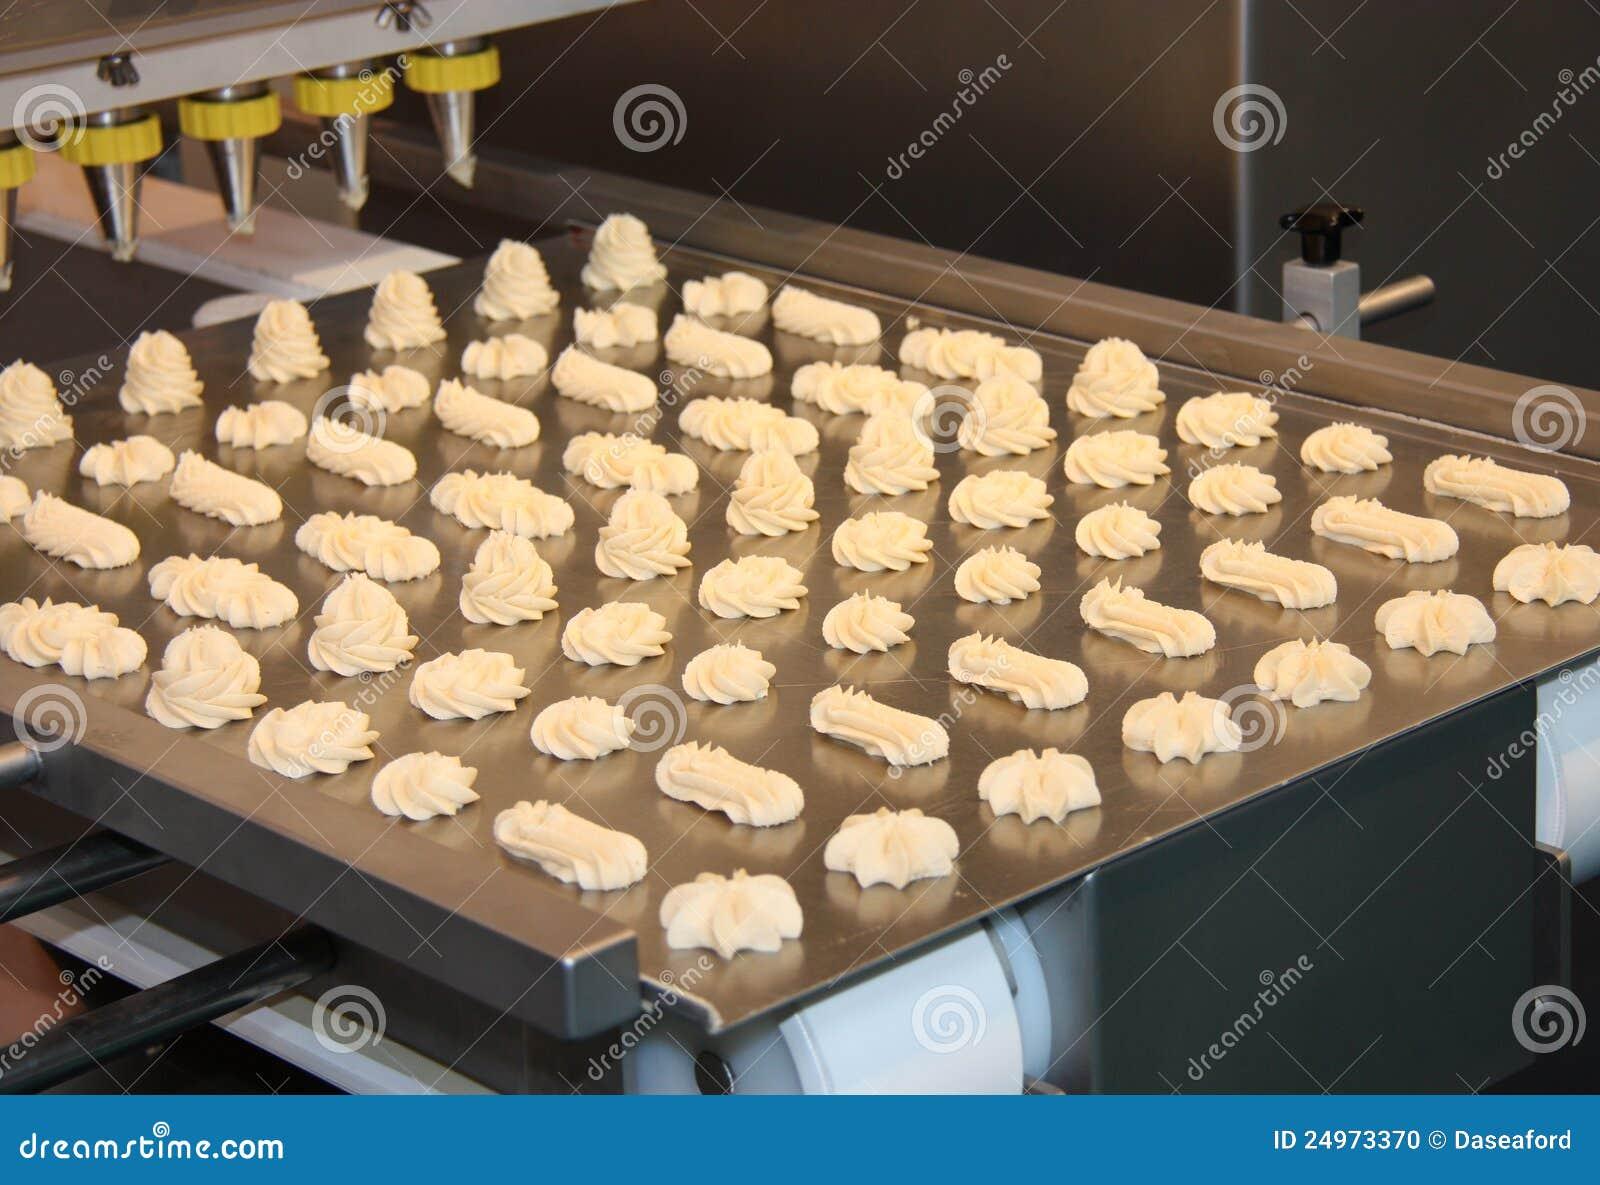 Nahrungsmittelaufbereitende Maschine.